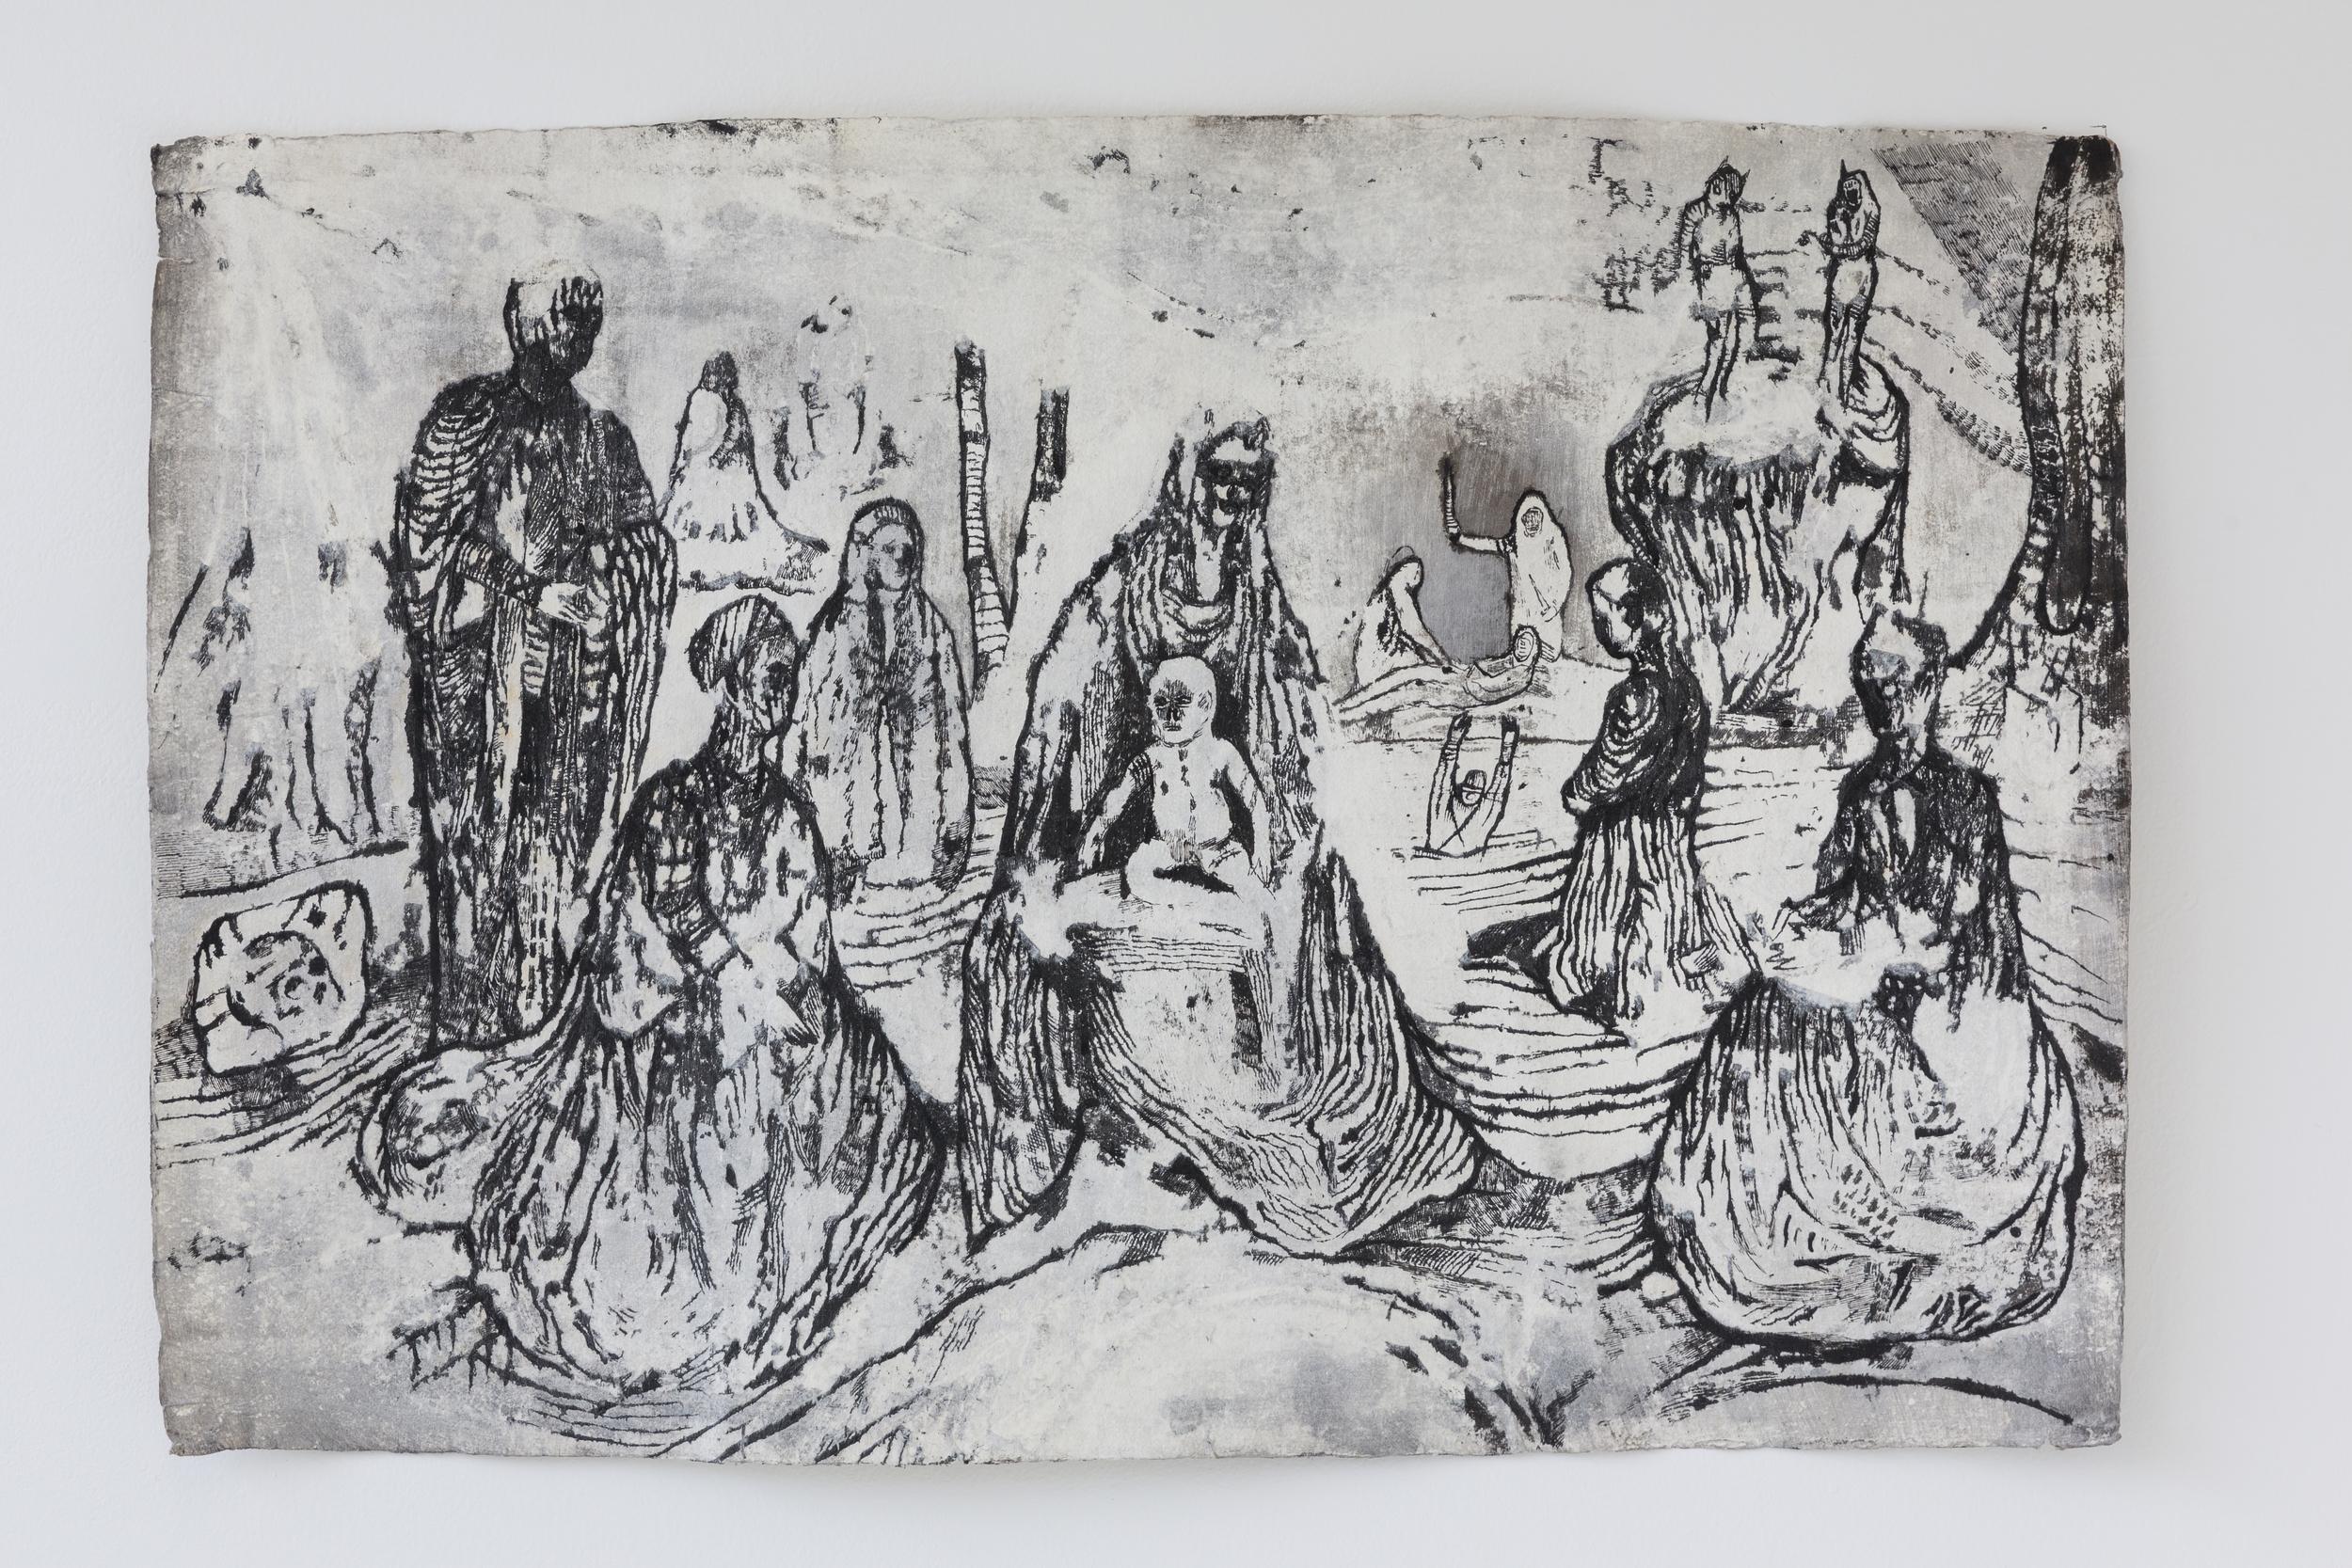 Josef Zlámal, bez názvu, 2009, tuš na ručním papíře, 100 x 70 cm